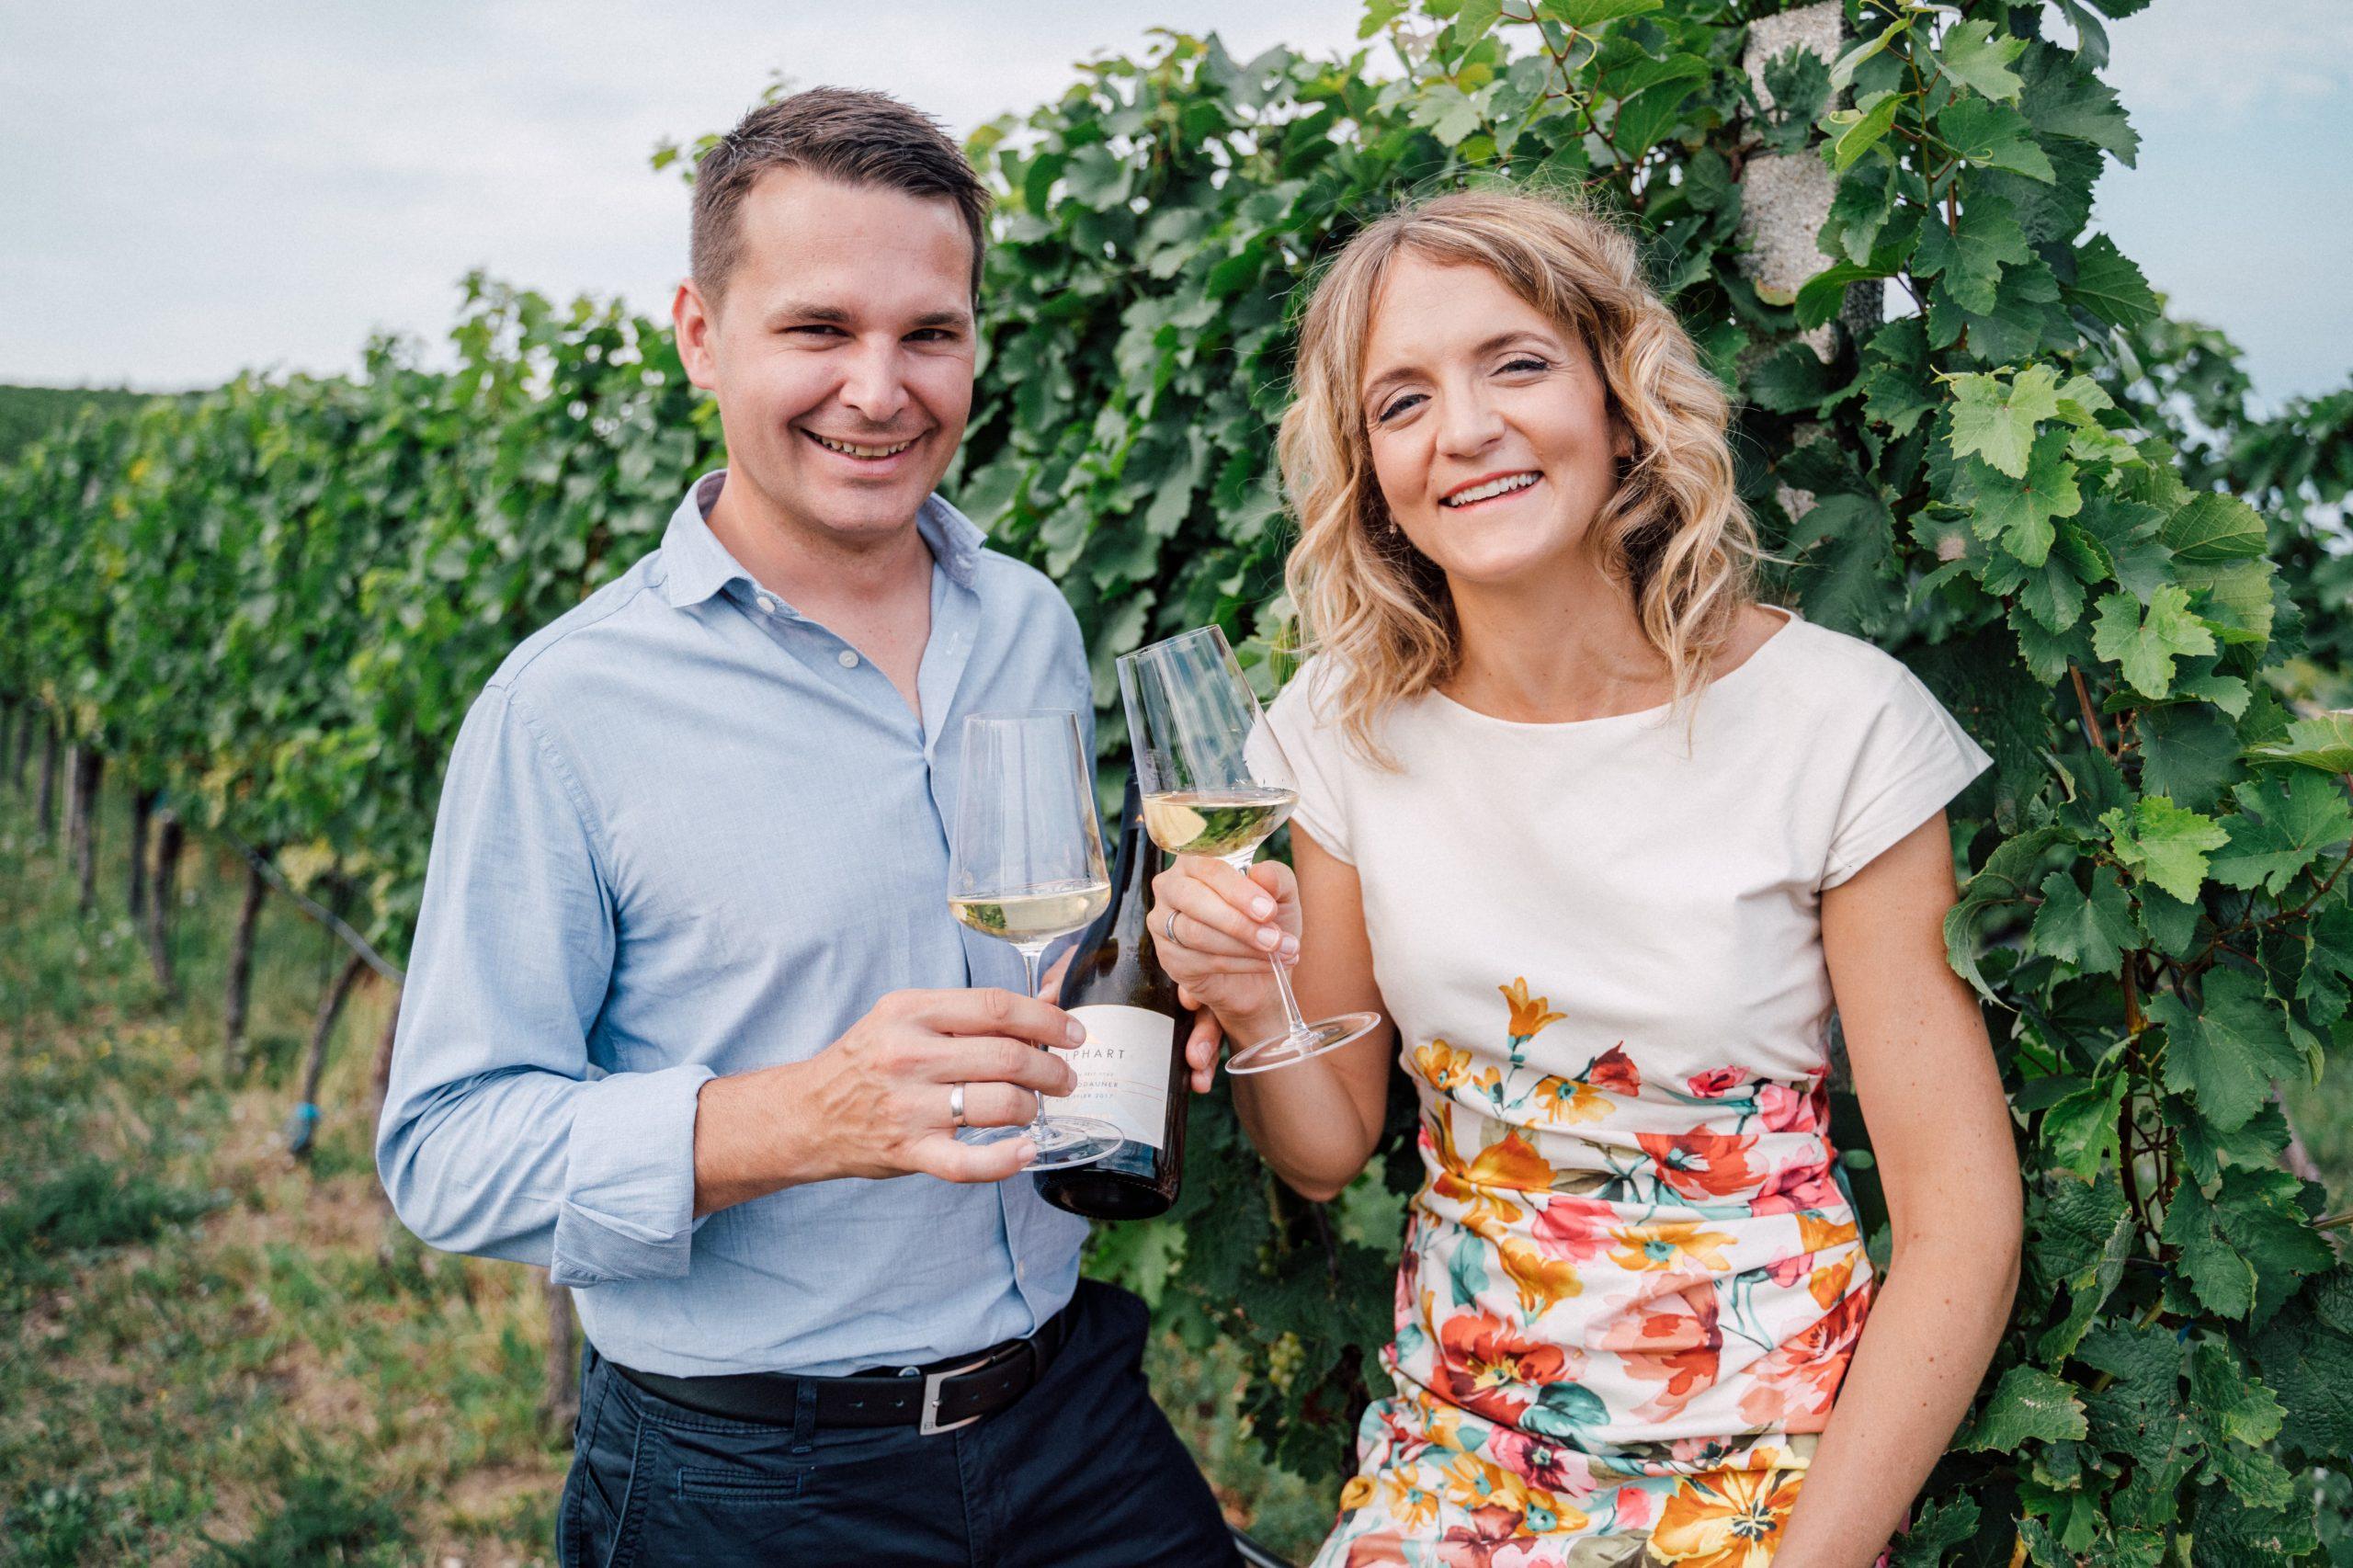 Weingut Alphart - tasting in the vineyard